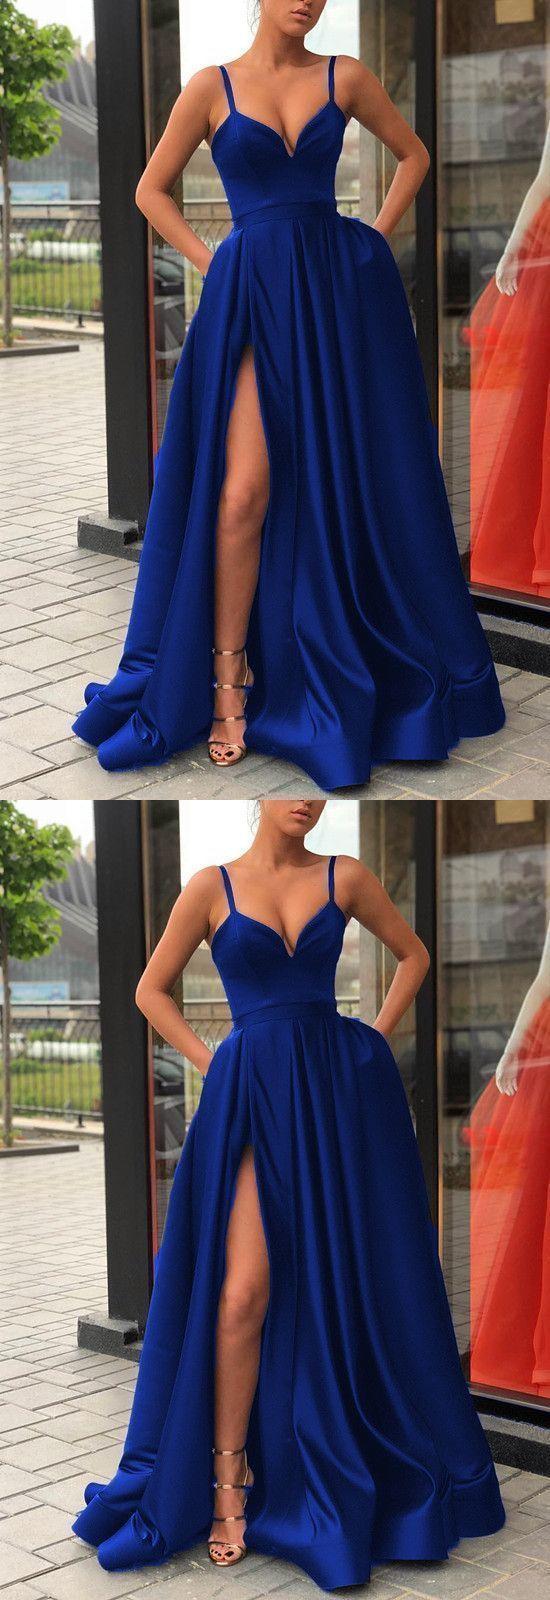 Royal Blue Prom Dress Slit Skirt, Dance Dresses, Graduation School Party Gown, DT0235 #bluepromdresses